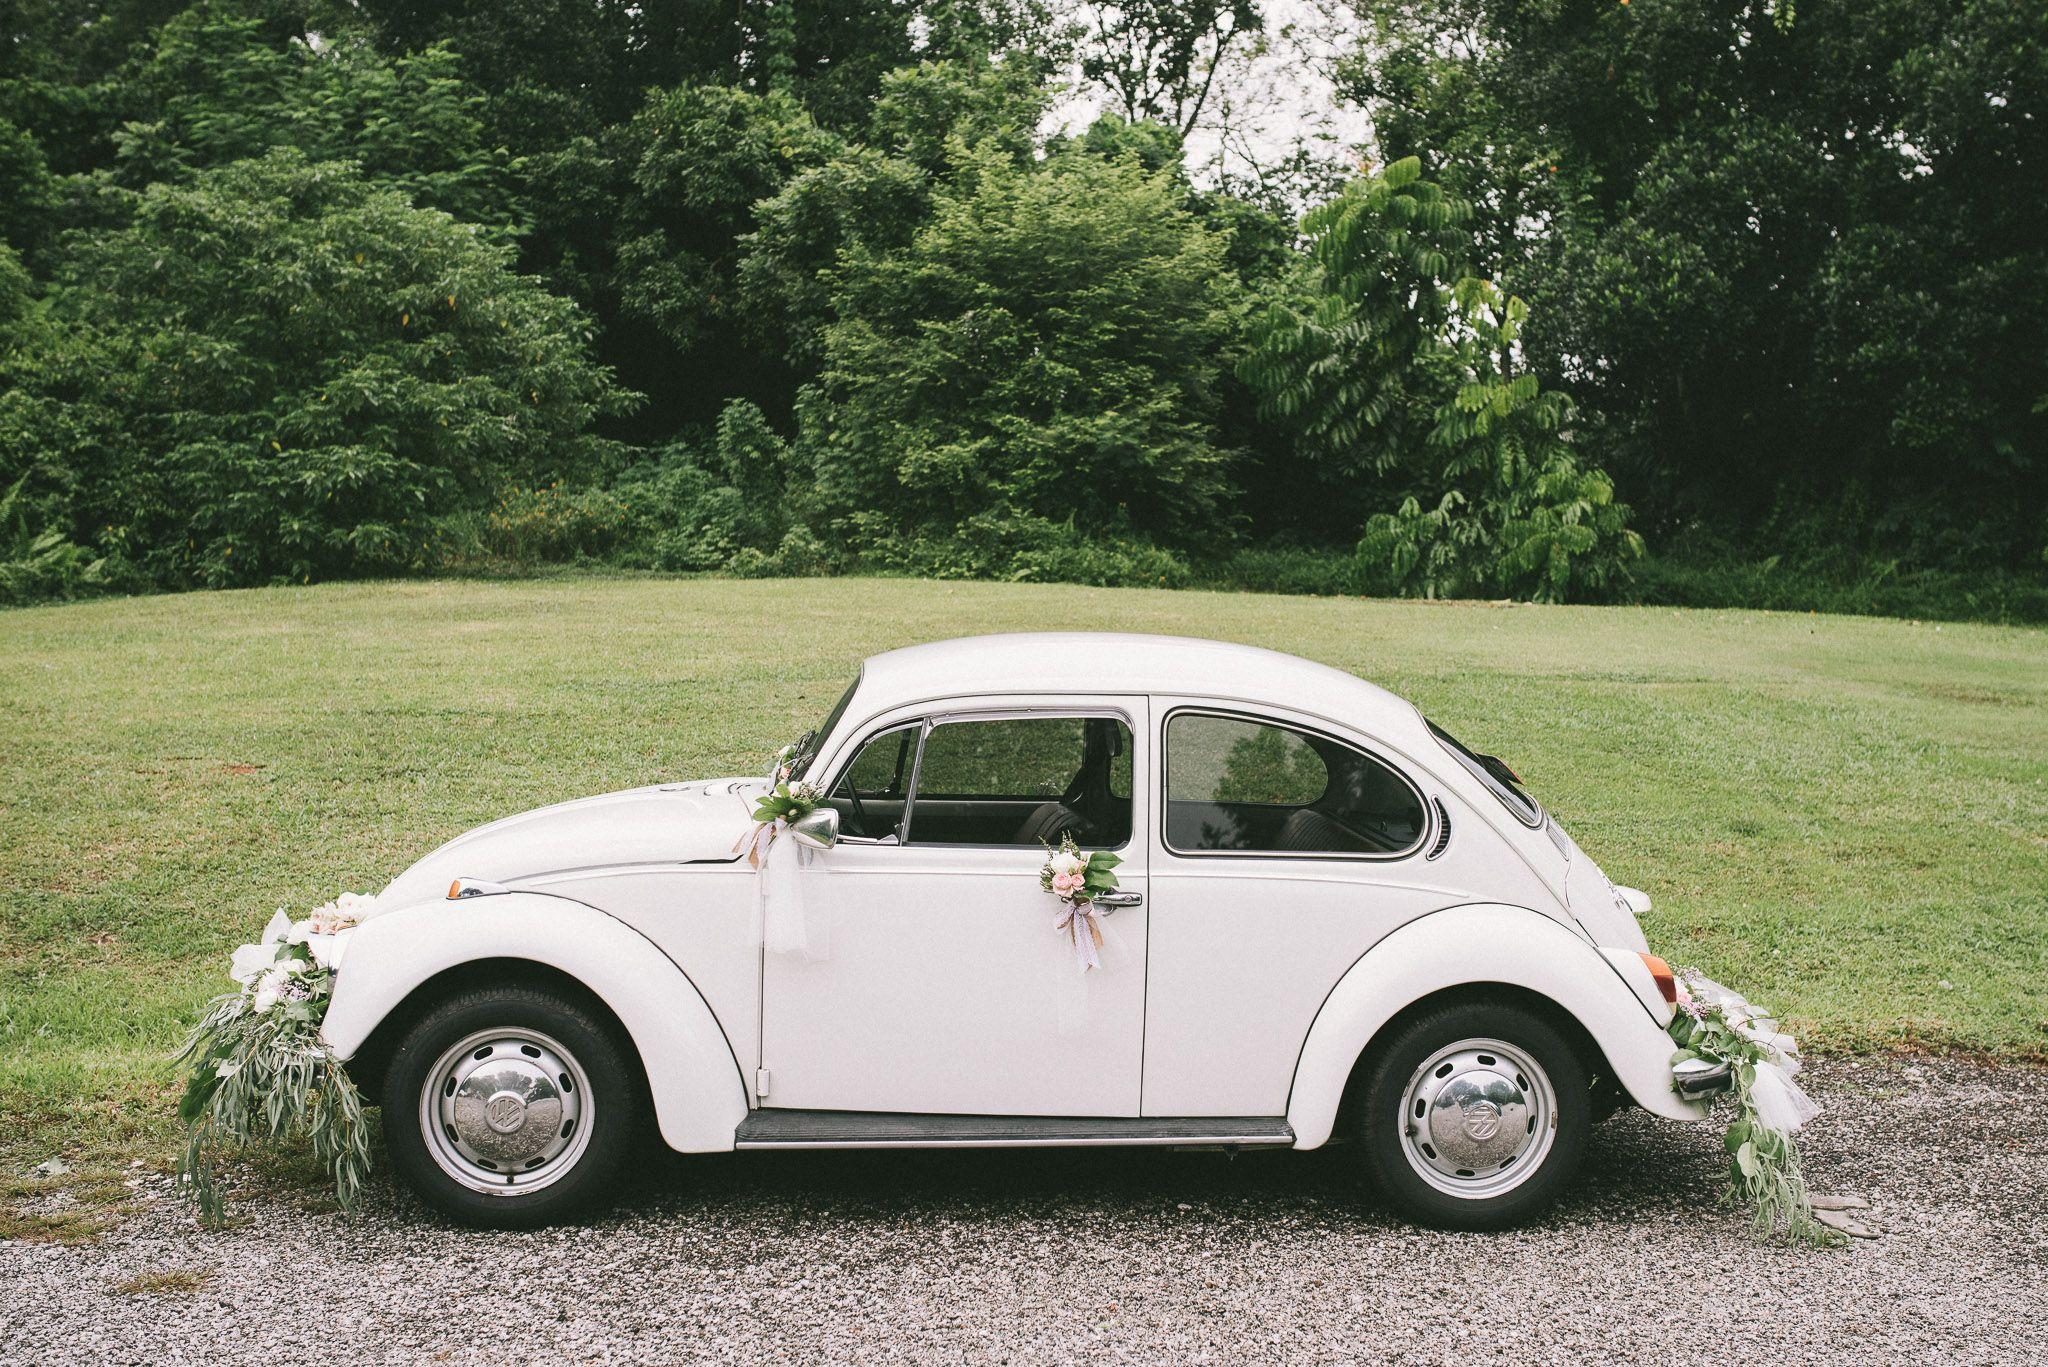 Vintage Wedding Car by Minibug   Vintage Wedding Car   Pinterest ...